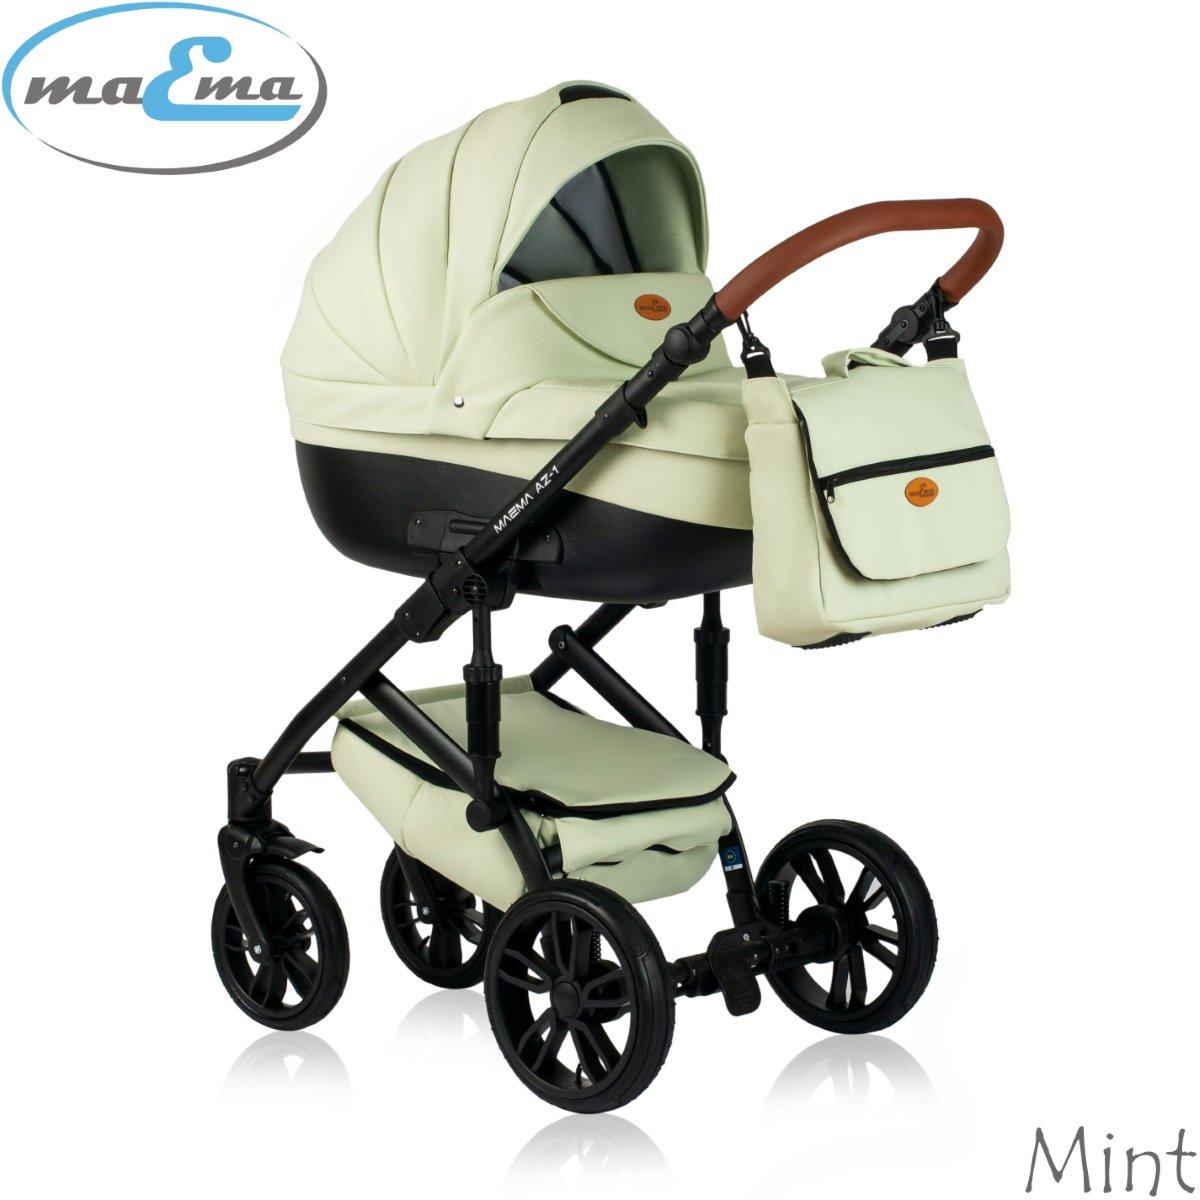 Maema AZ1 Mint Bērnu rati 3in1